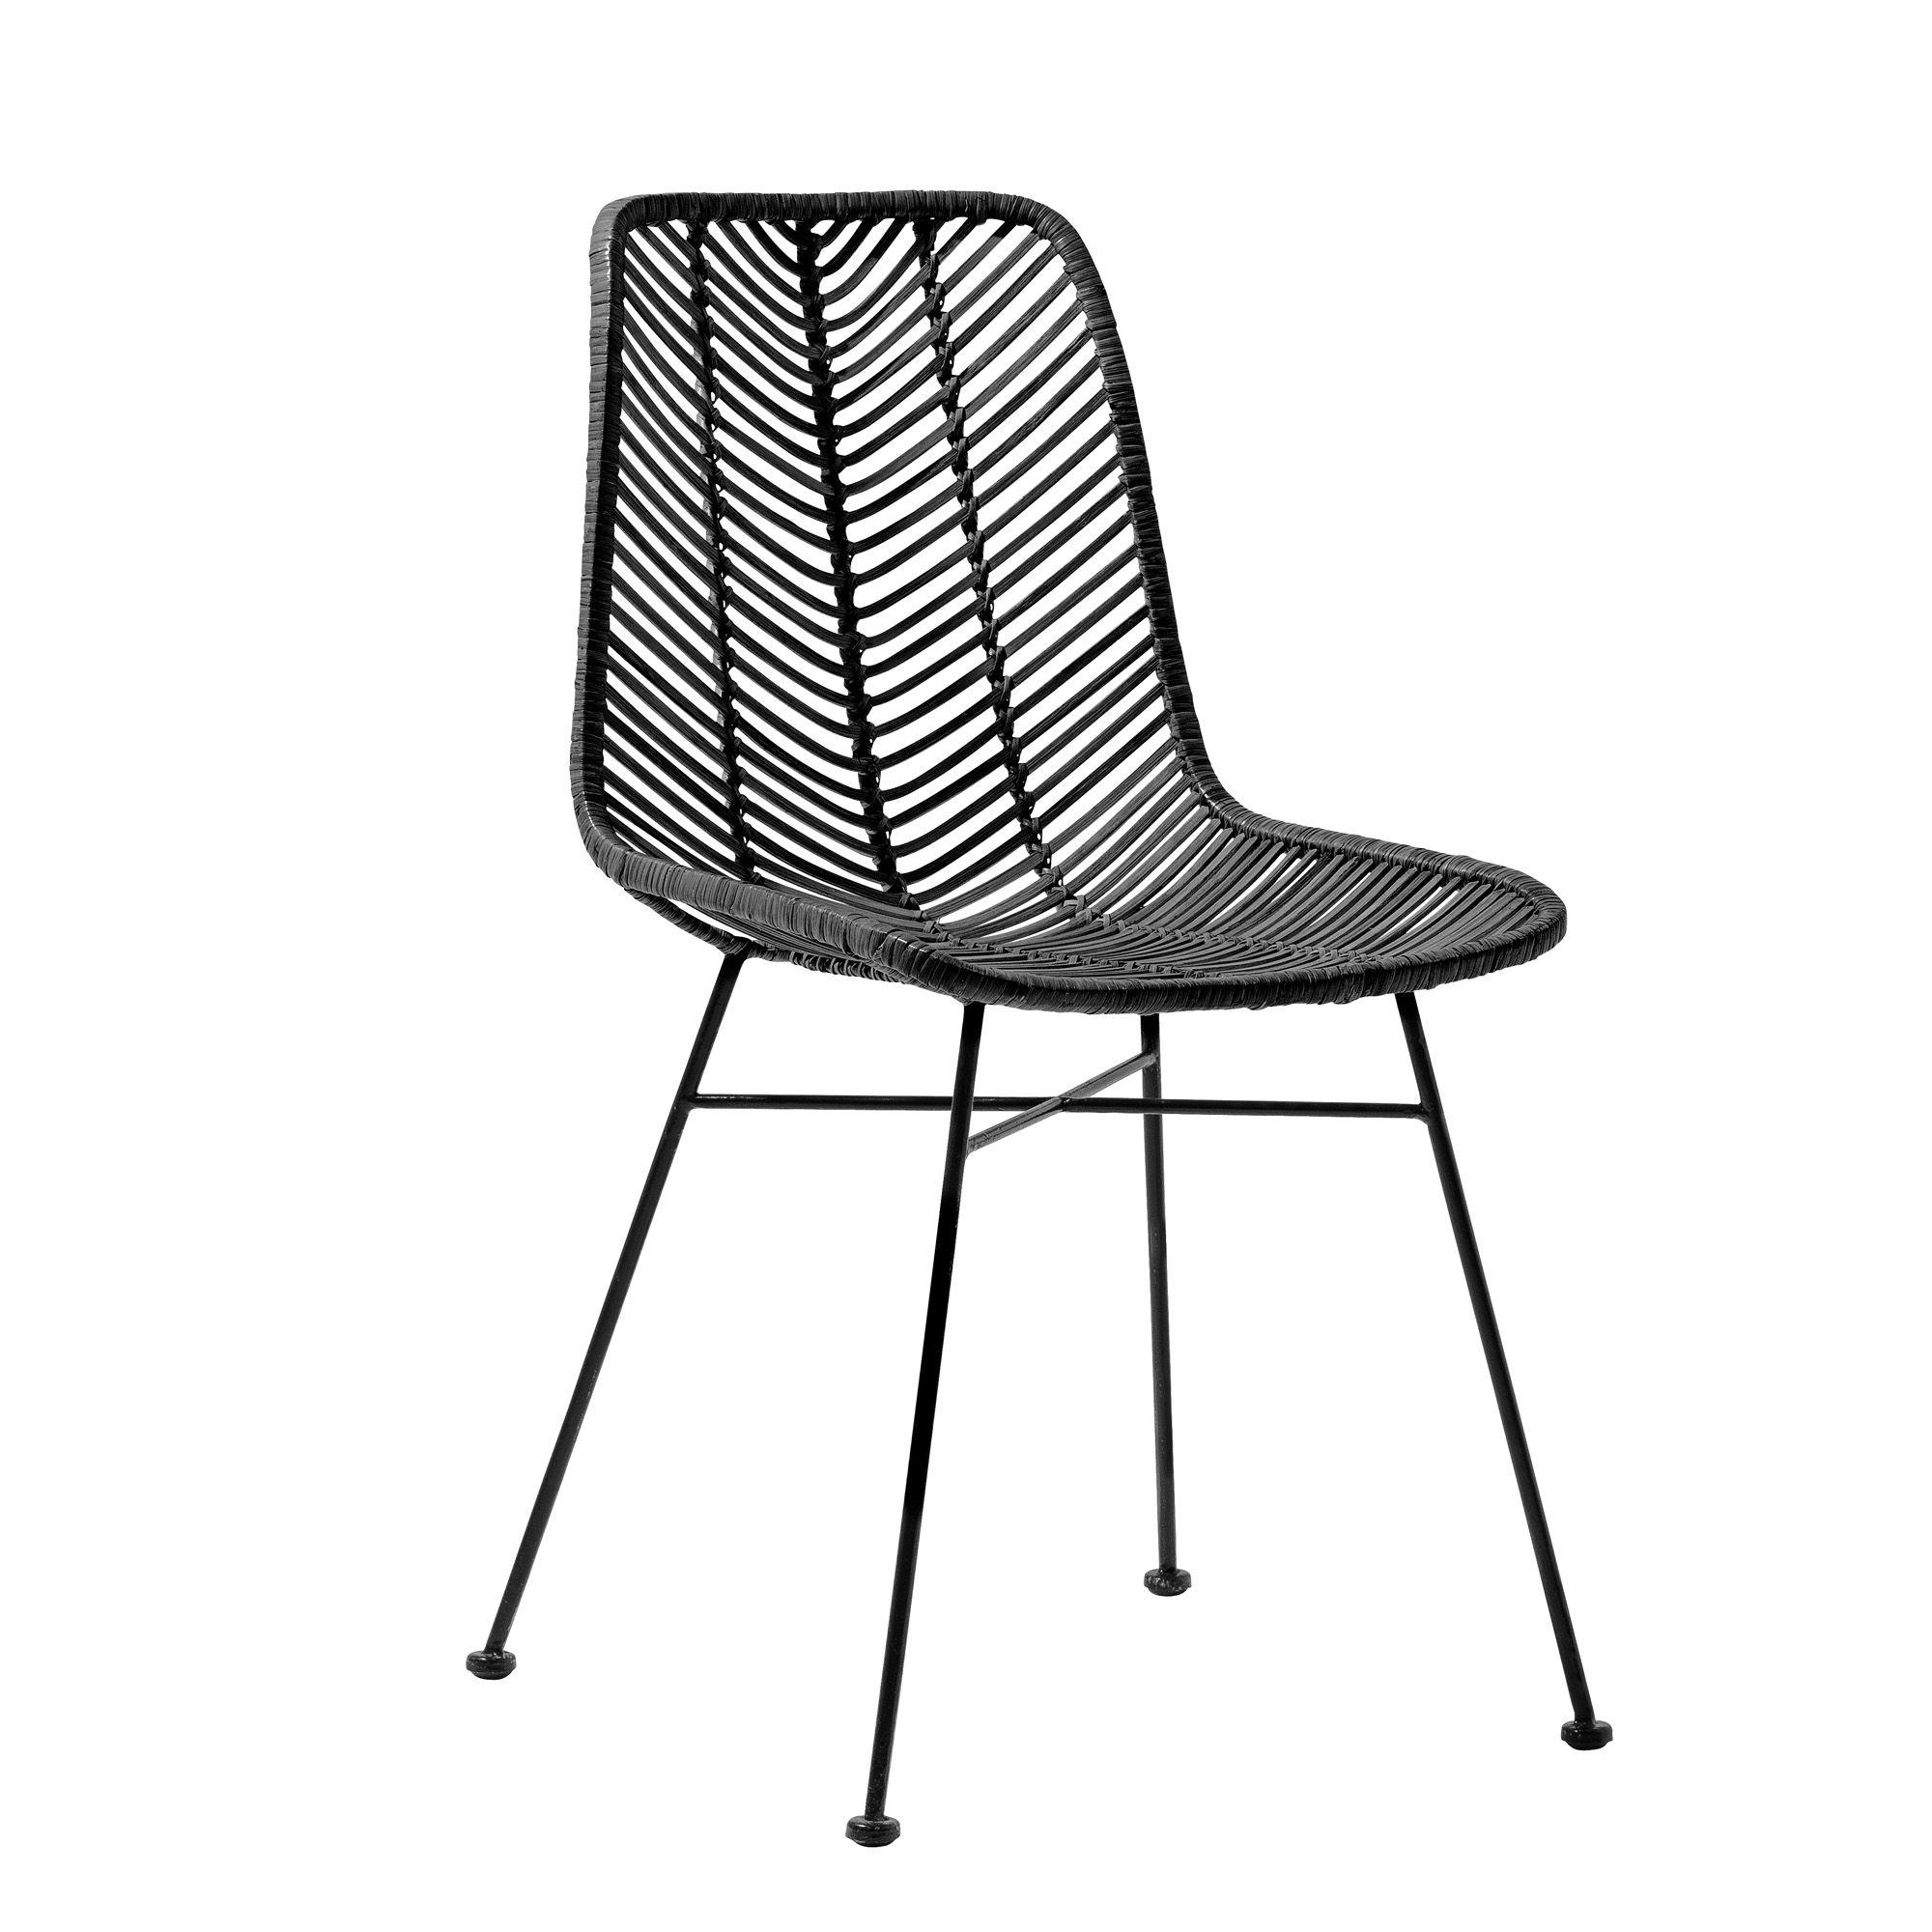 Billig Stuhl Metall Schwarz